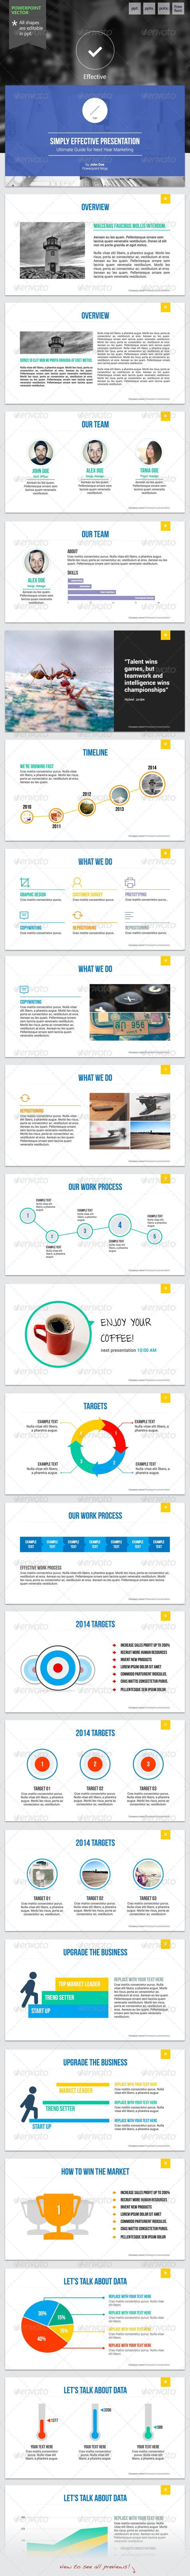 Effective 2 - Powerpoint Template - PowerPoint Templates Presentation Templates